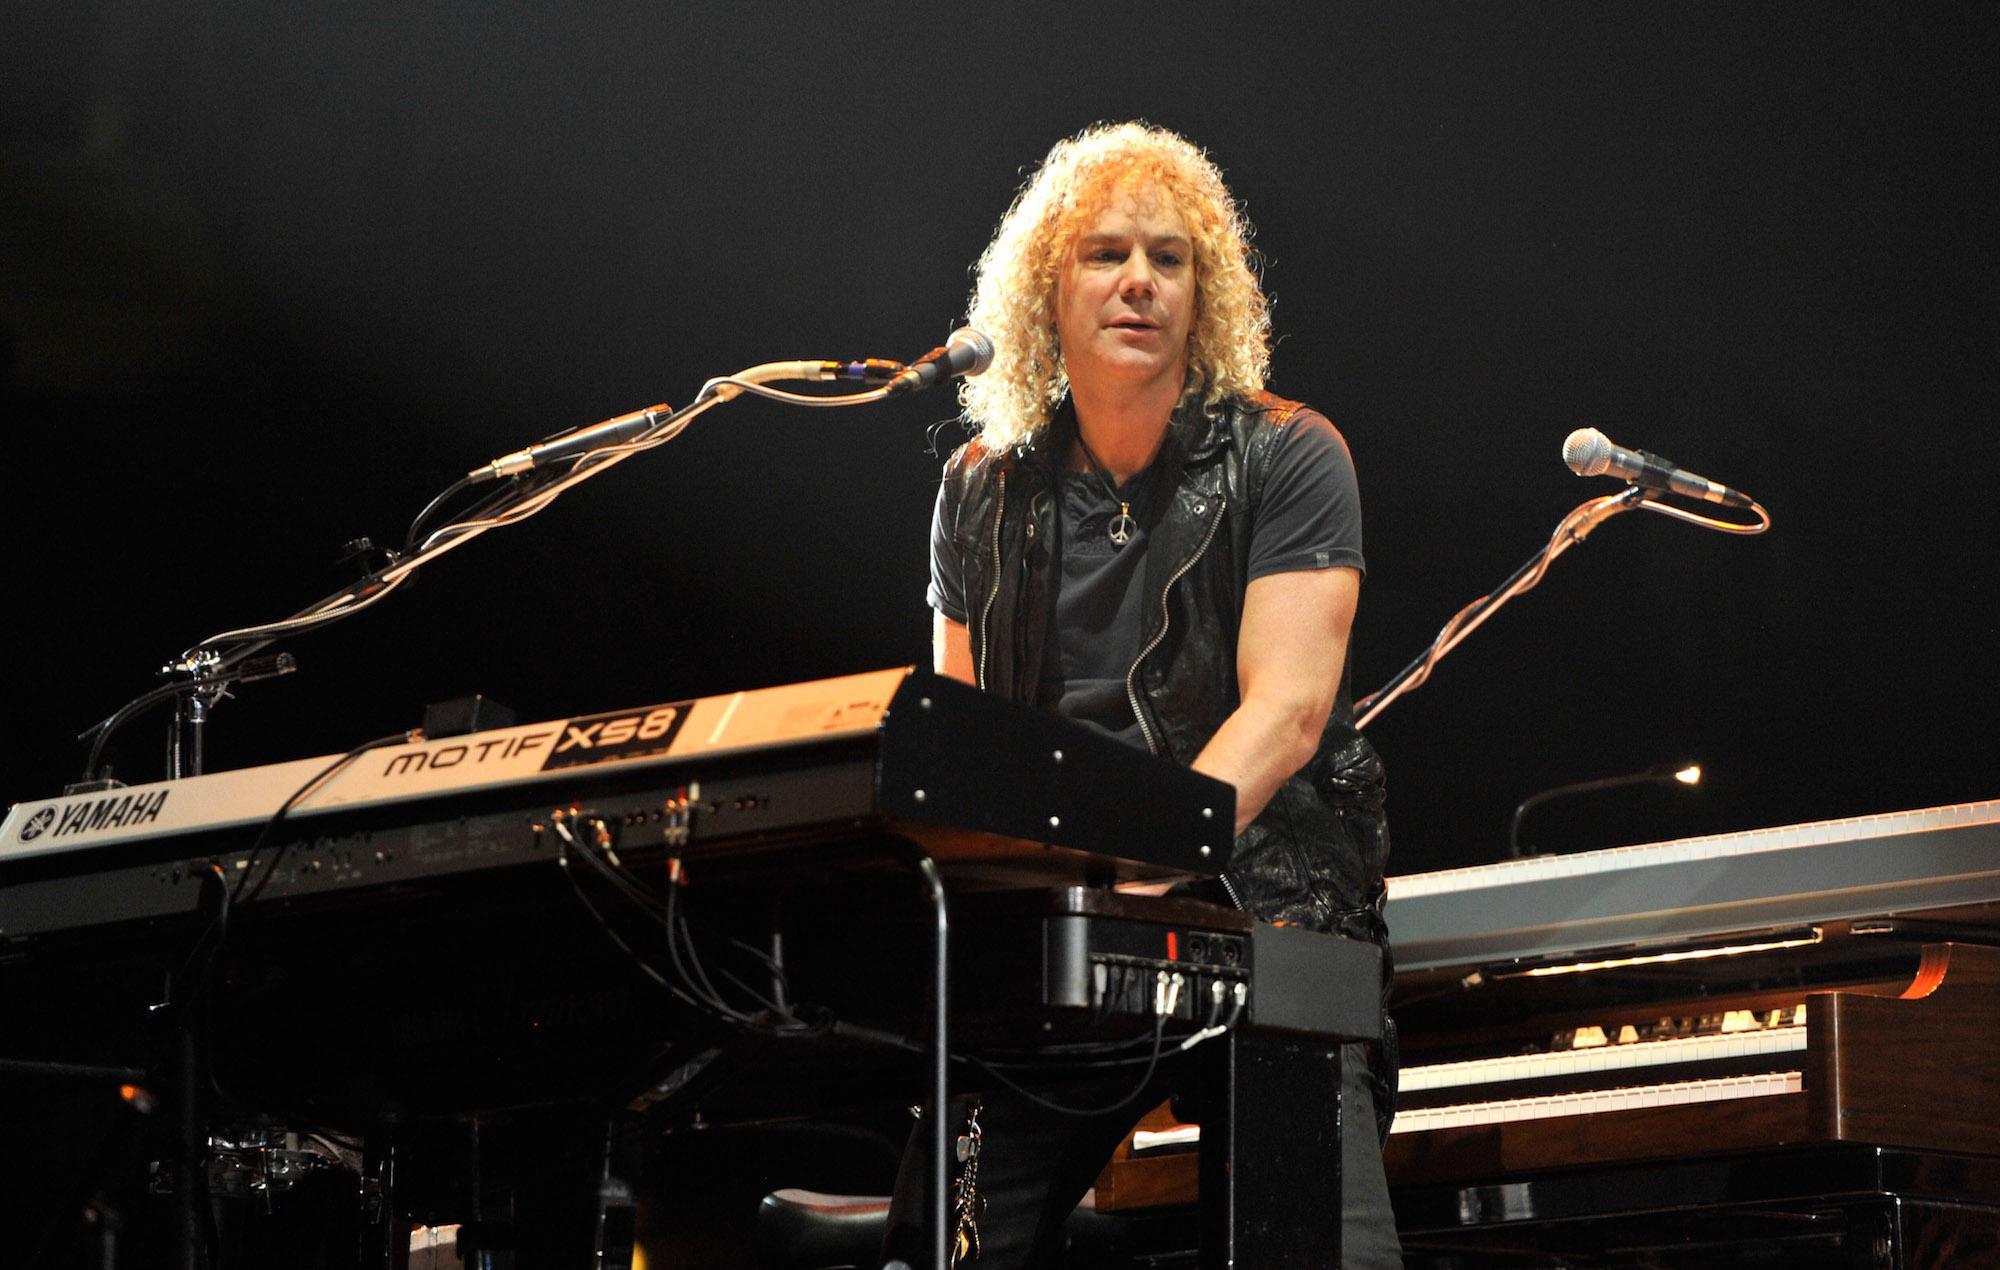 Bon Jovi keyboardist David Bryan has tested positive for coronavirus - EpicNews